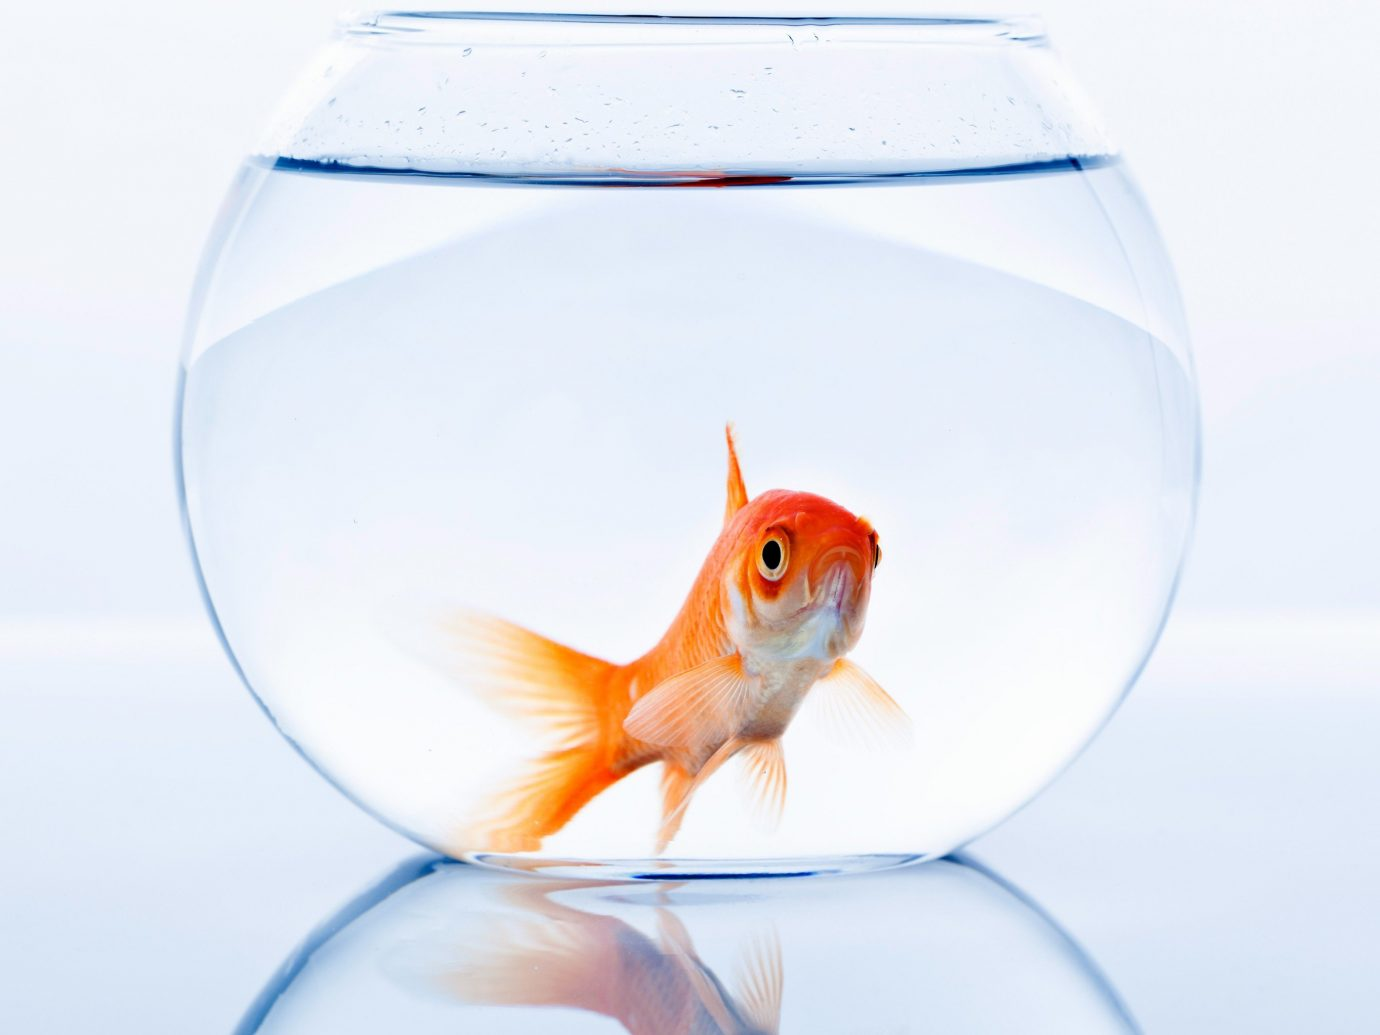 Hotels Offbeat fishbowl bubble goldfish fish vertebrate reflection vessel illustration bell jar